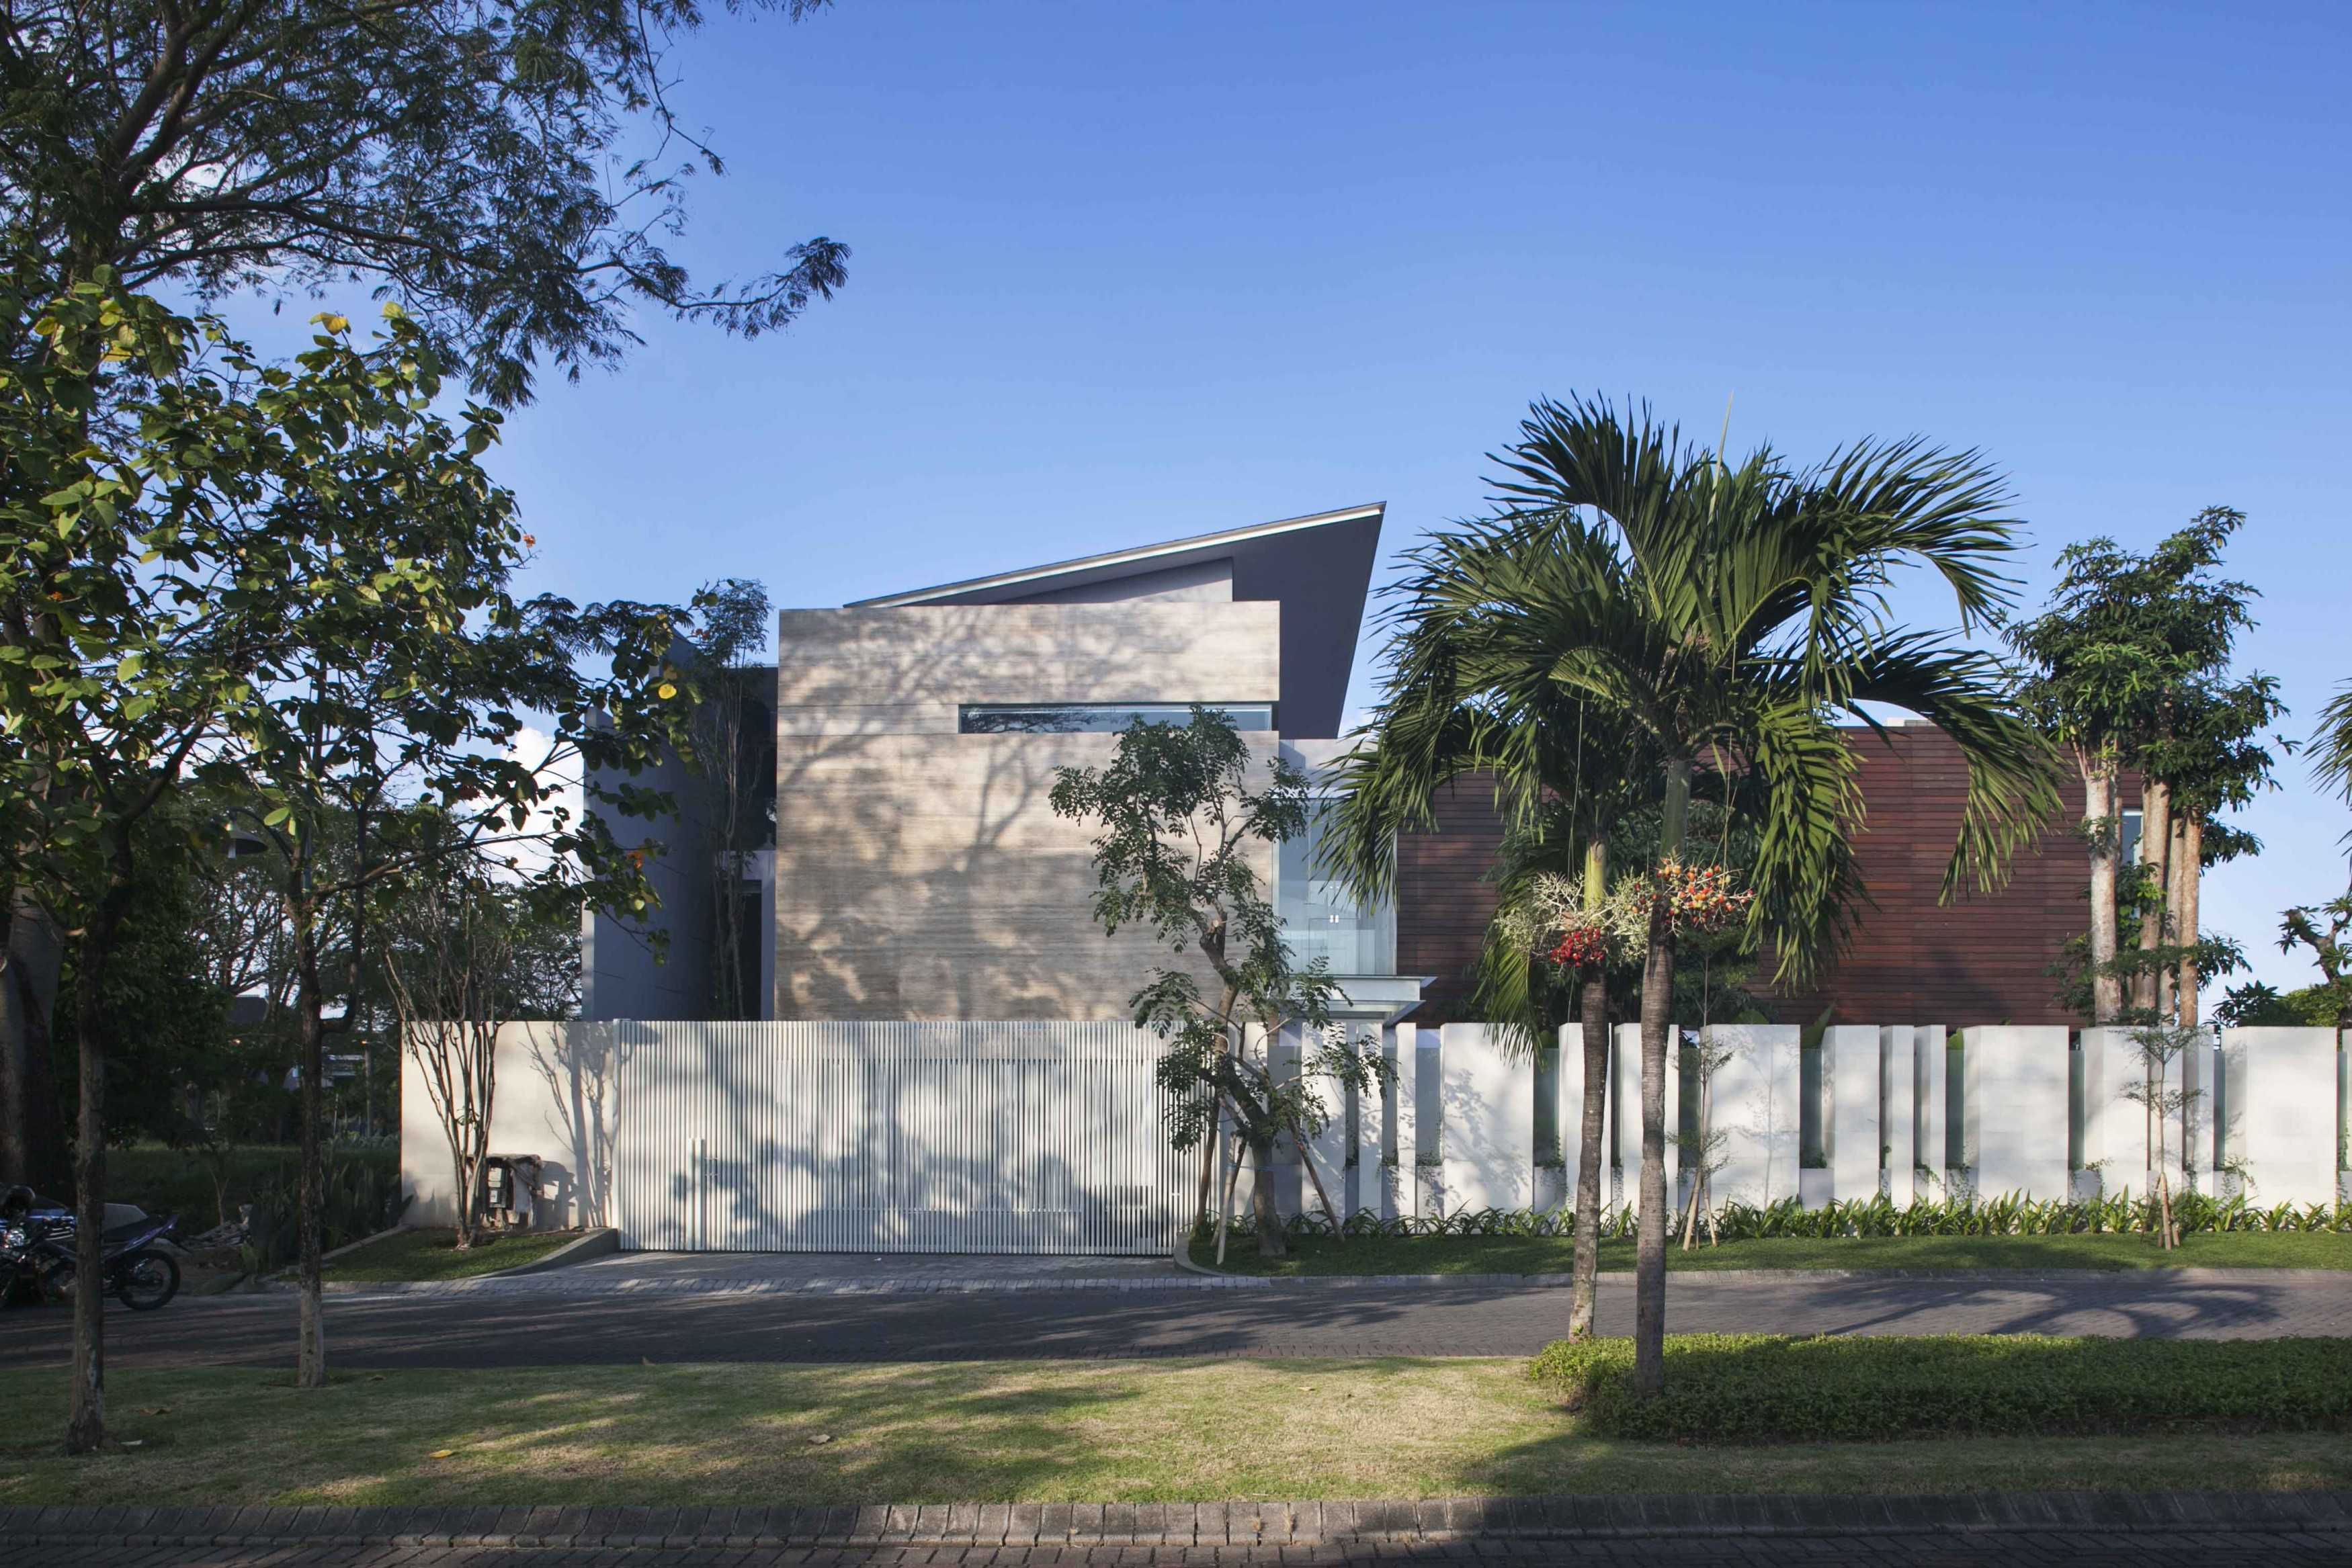 Das Quadrat Selat House Surabaya, Indonesia Surabaya, Indonesia Exterior View Modern  9370